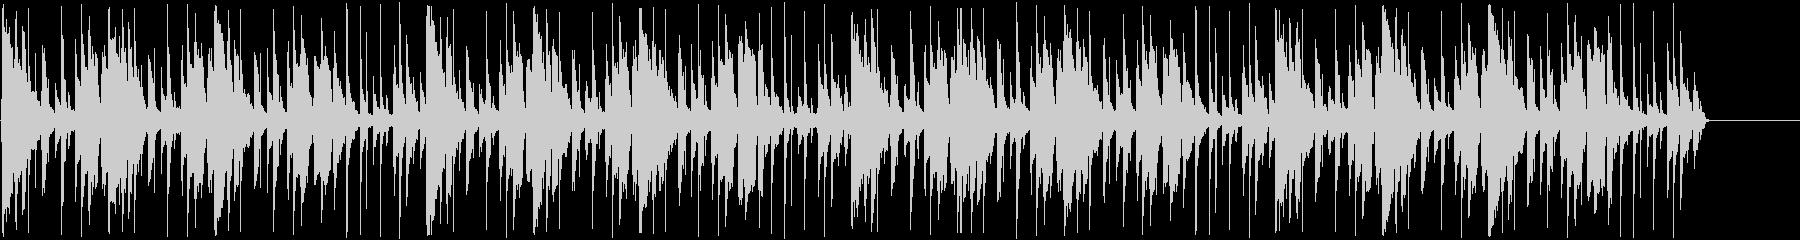 BGM_ステージセレクトAの未再生の波形